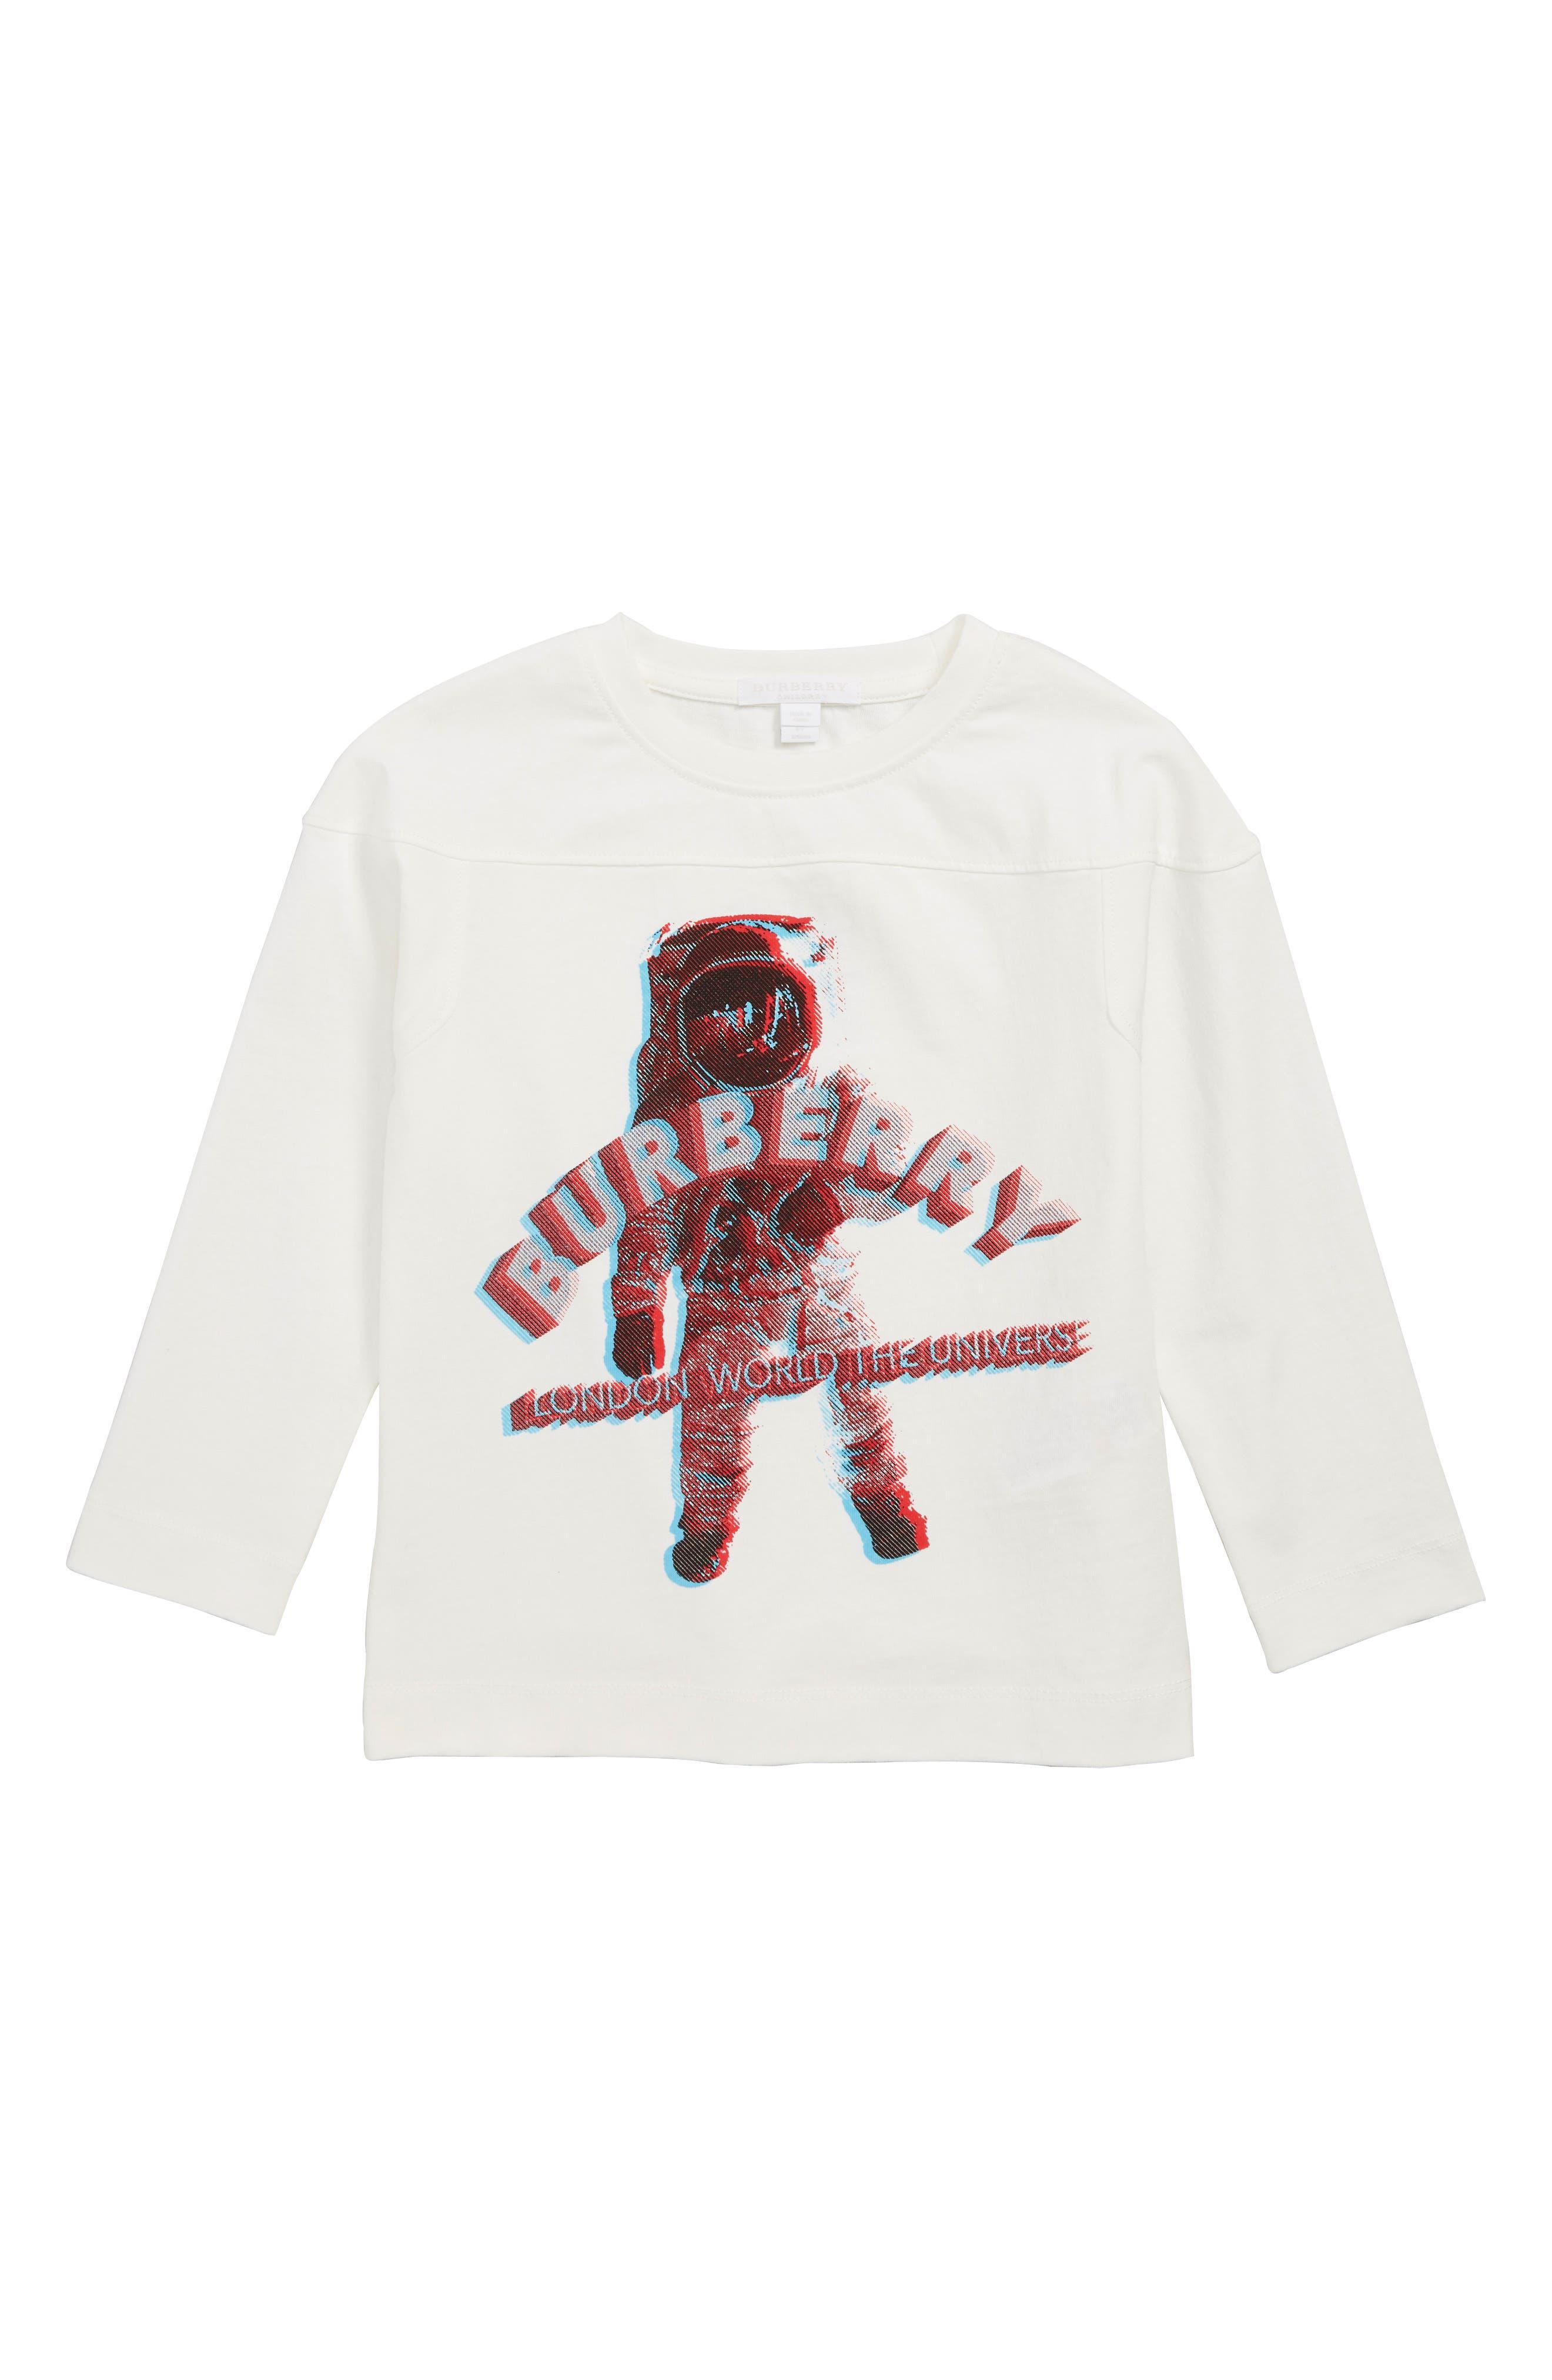 BURBERRY,                             3D Spaceman Graphic T-Shirt,                             Main thumbnail 1, color,                             100